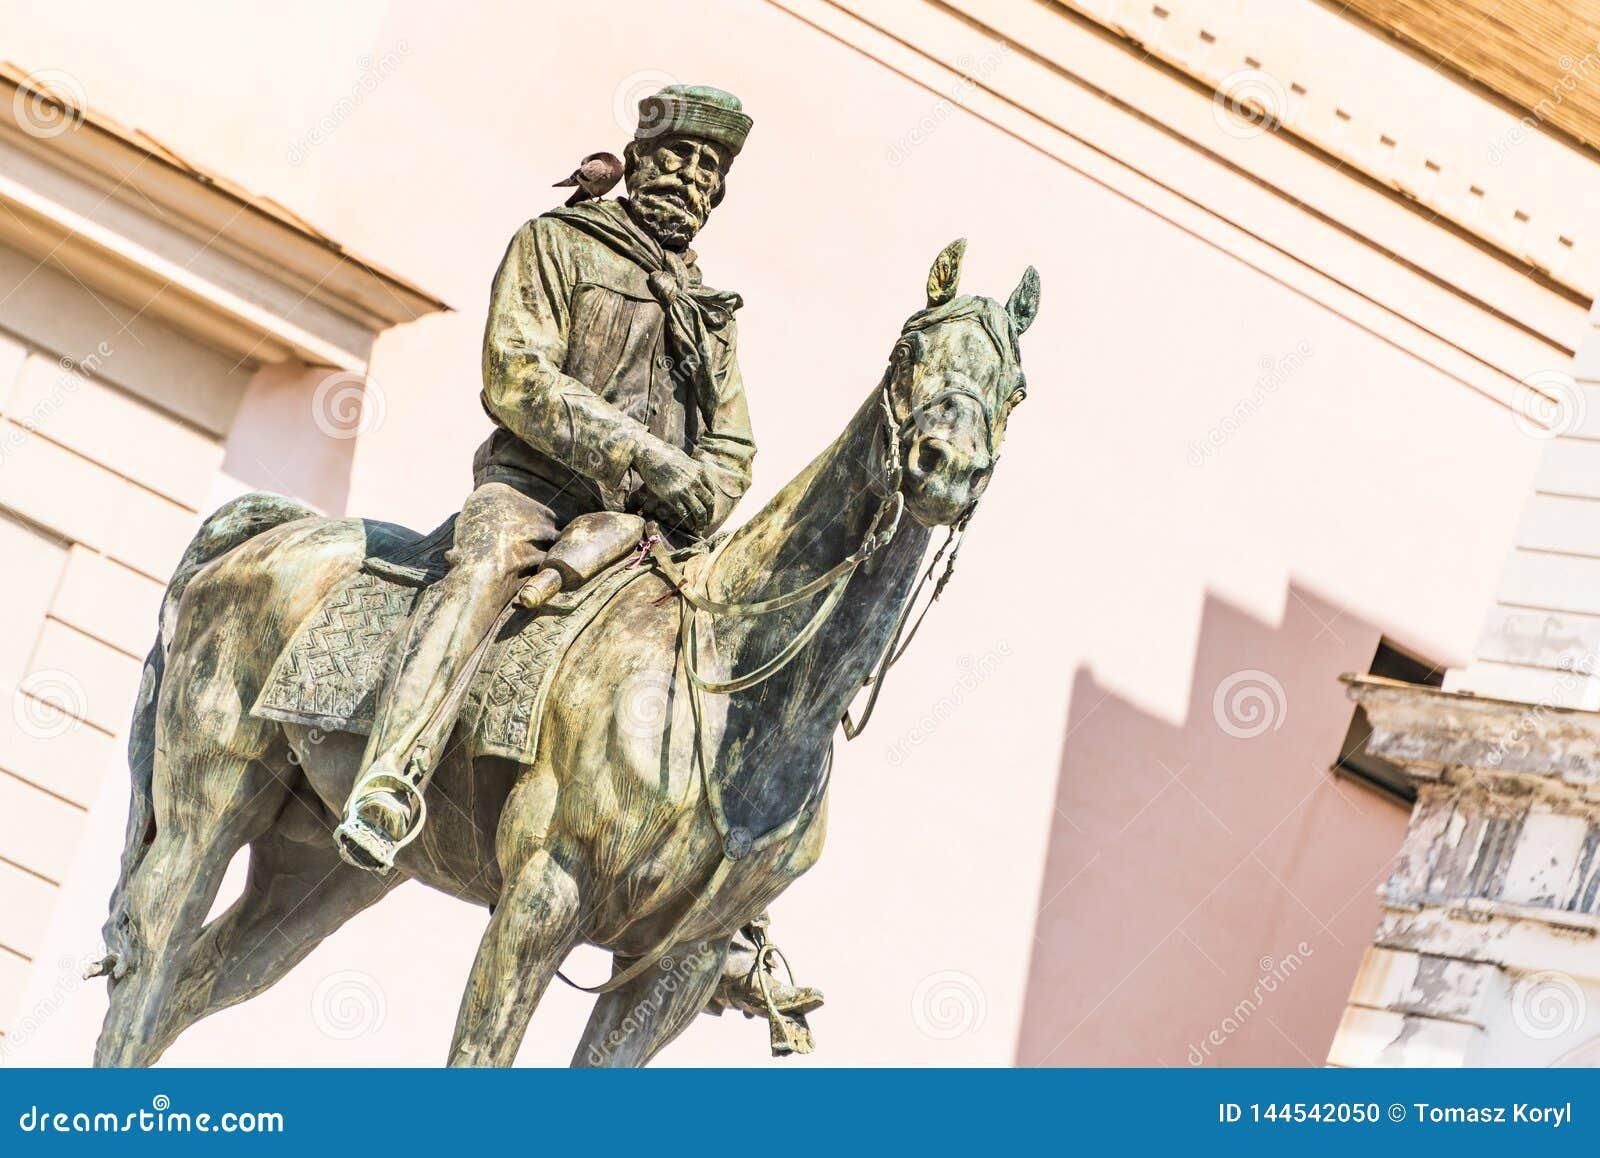 La statue de Giuseppe Garibaldi sur le cheval, Genoa Piazza de Ferrari, au centre de Gênes, la Ligurie, Italie [t